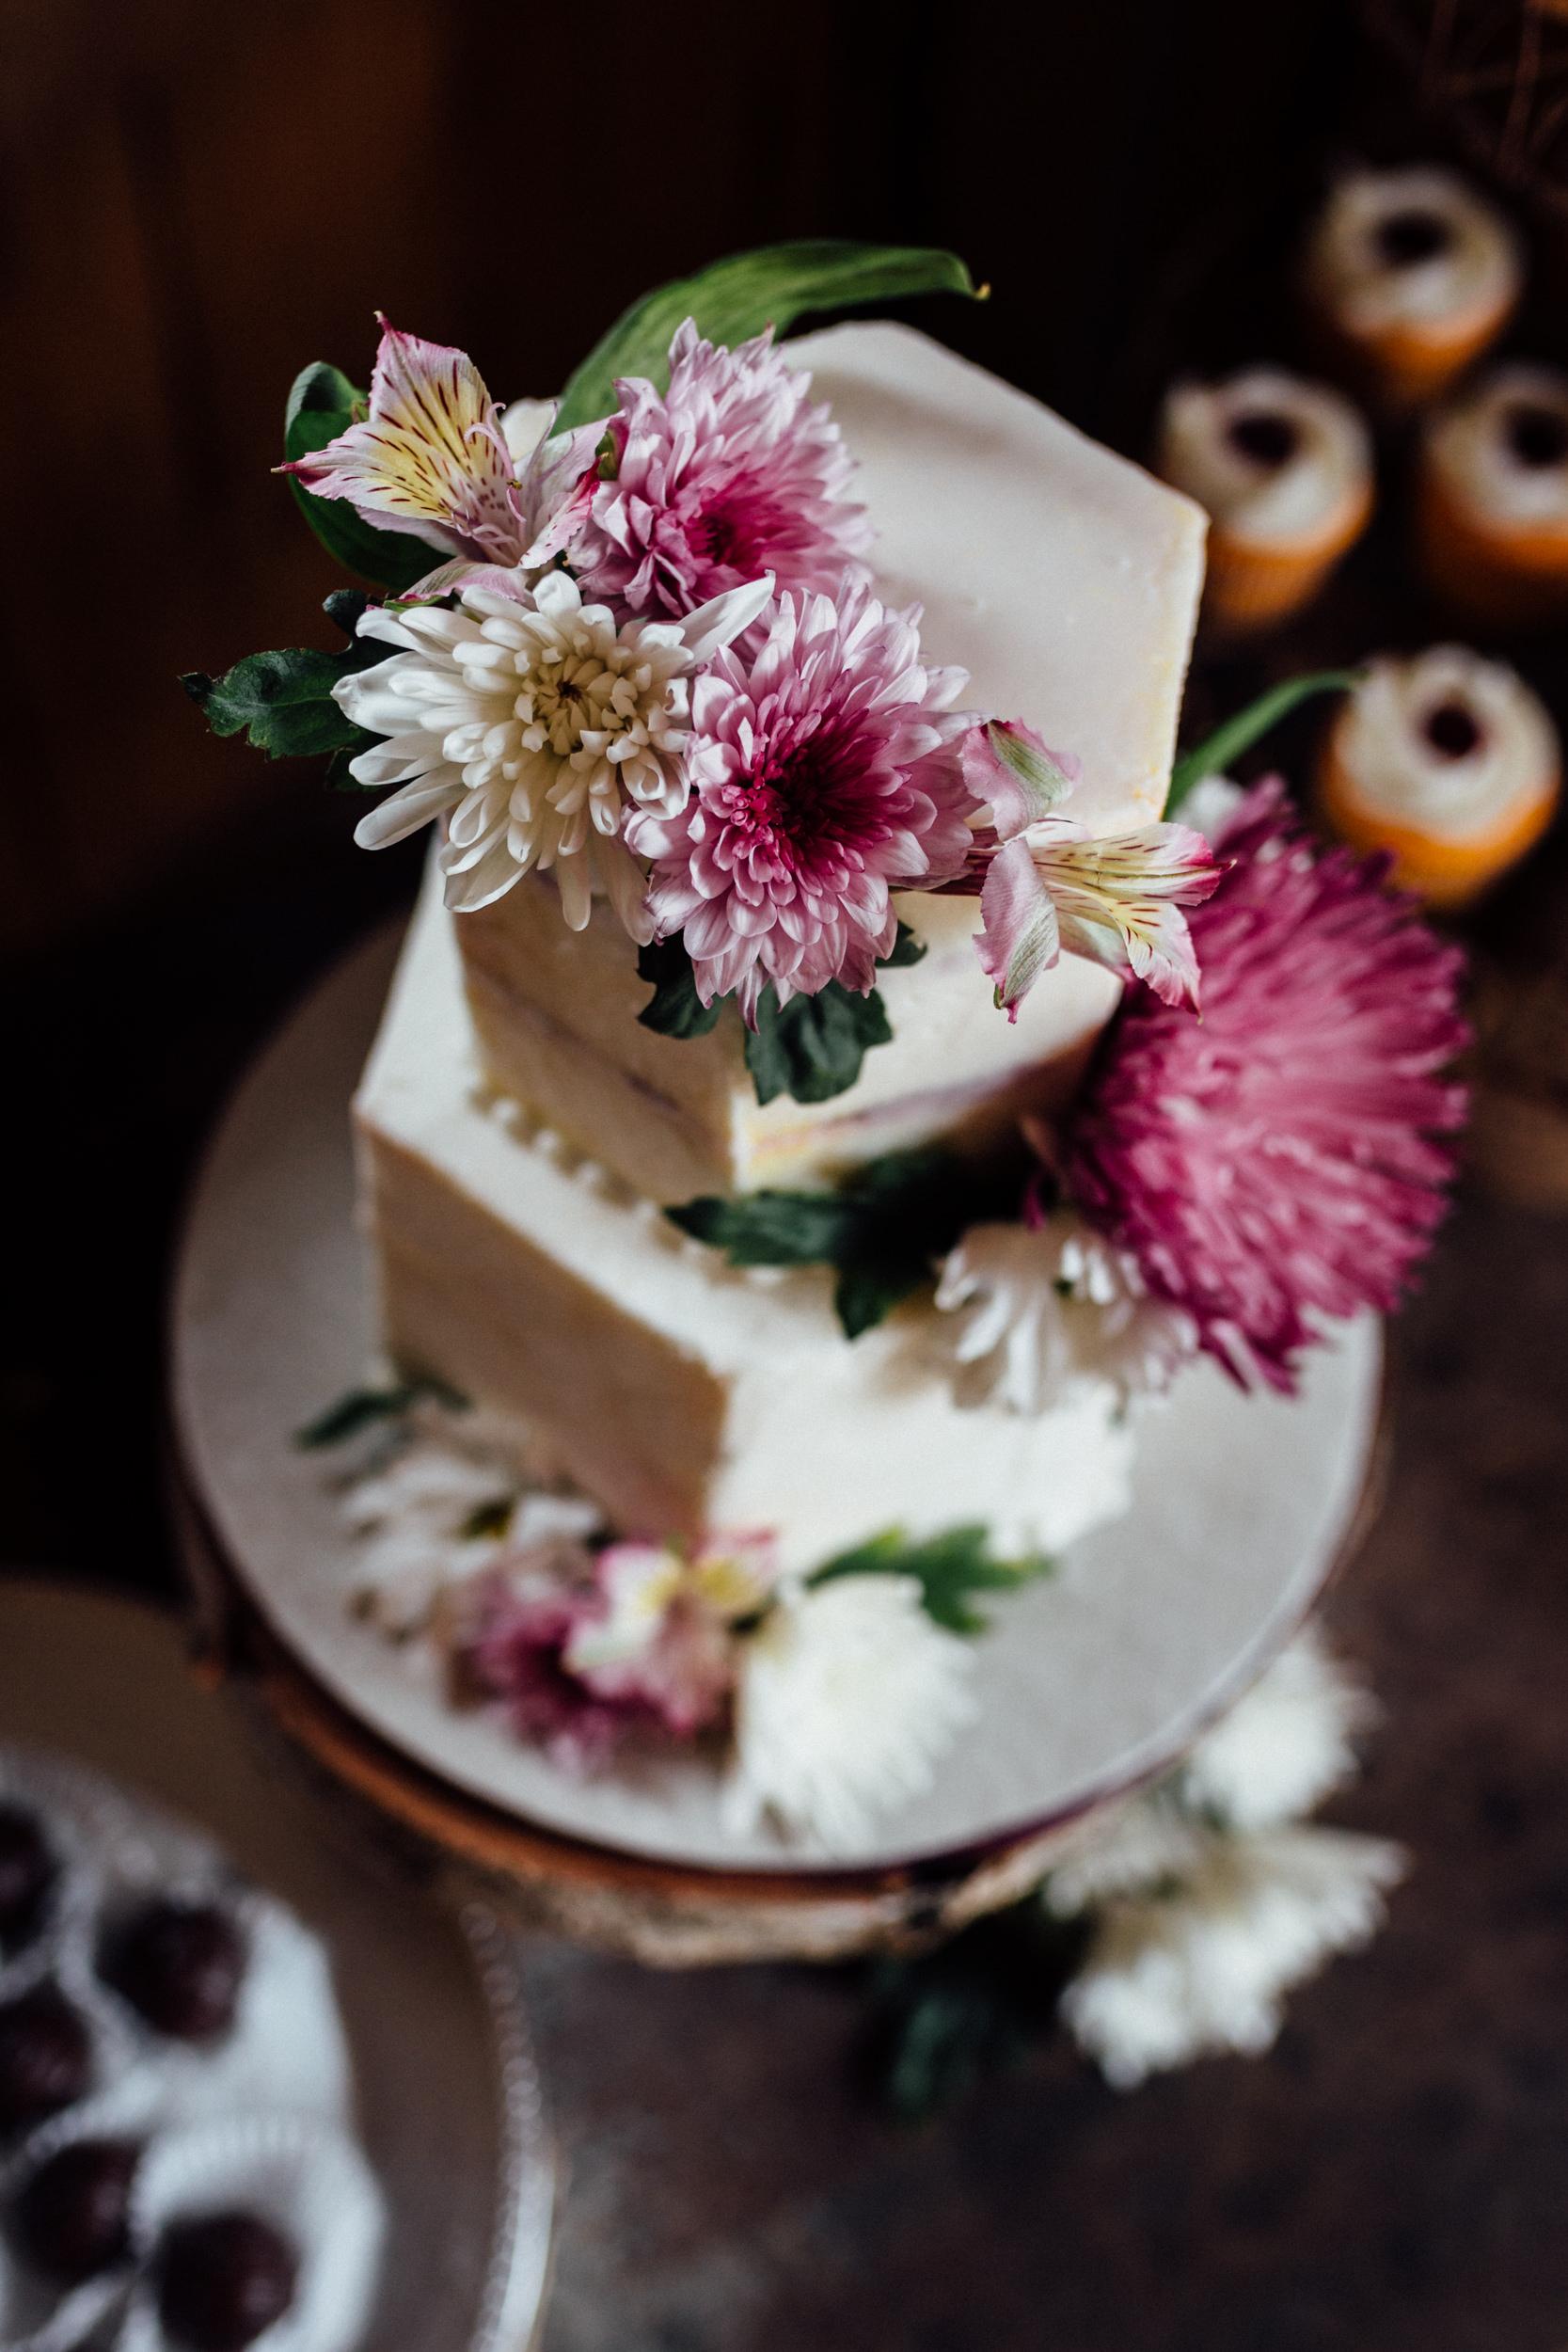 Midnight Sun Cakery wedding cake with flowers